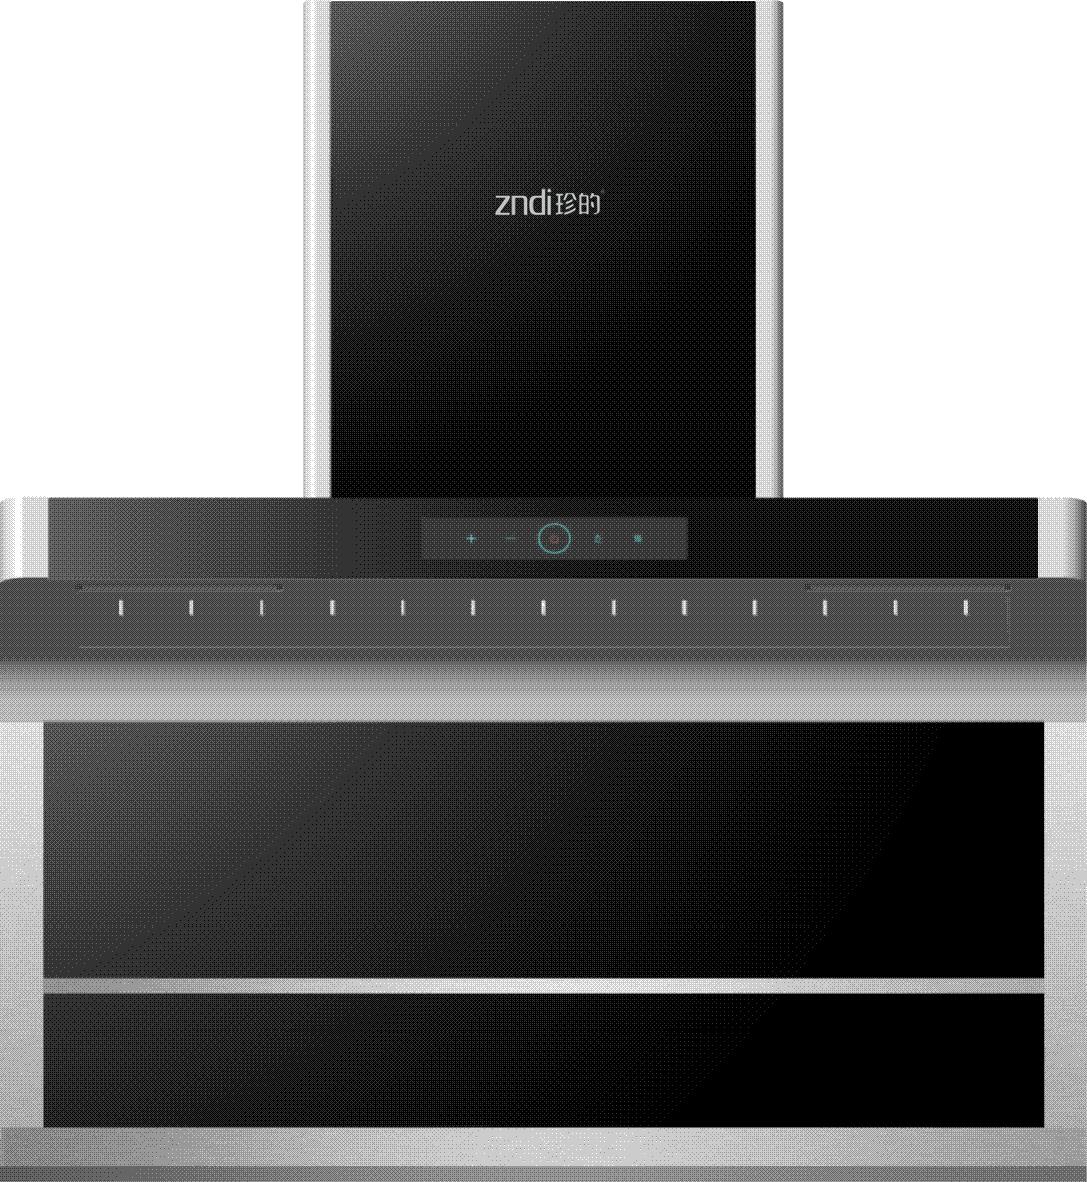 ZD1240